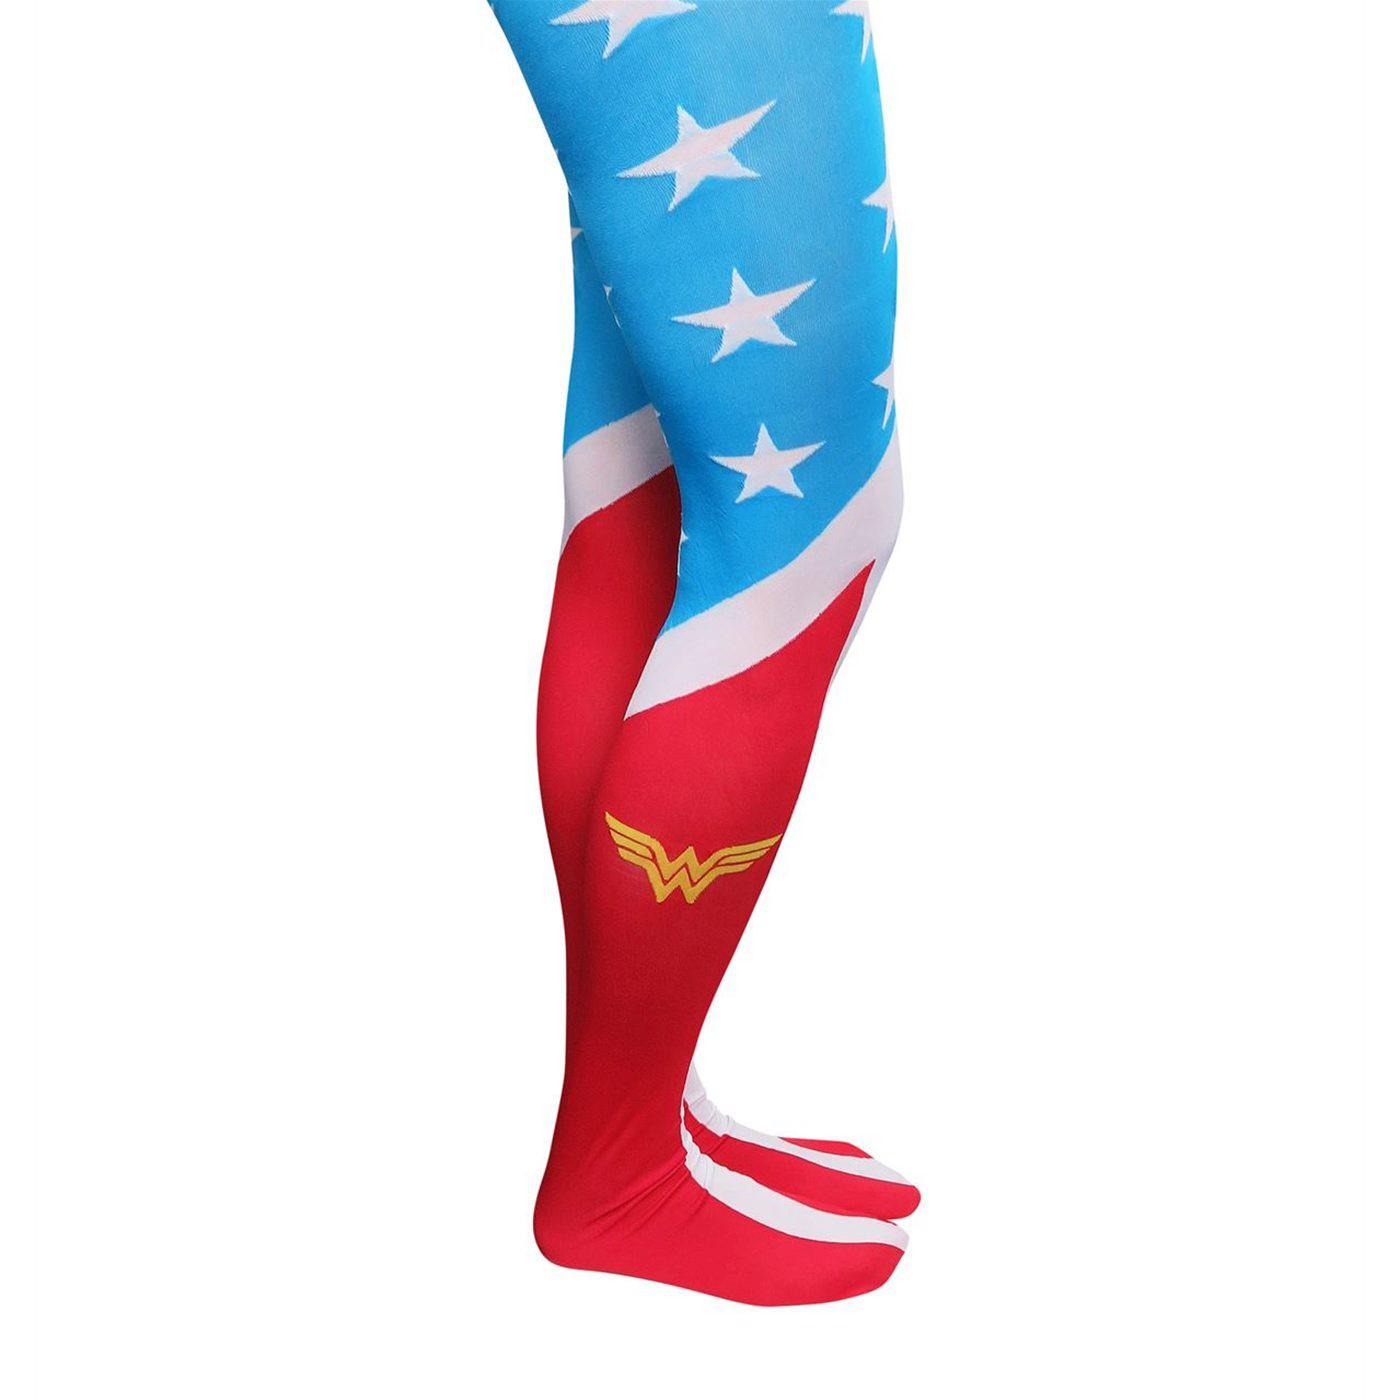 Wonder Woman Costume Women's Tights